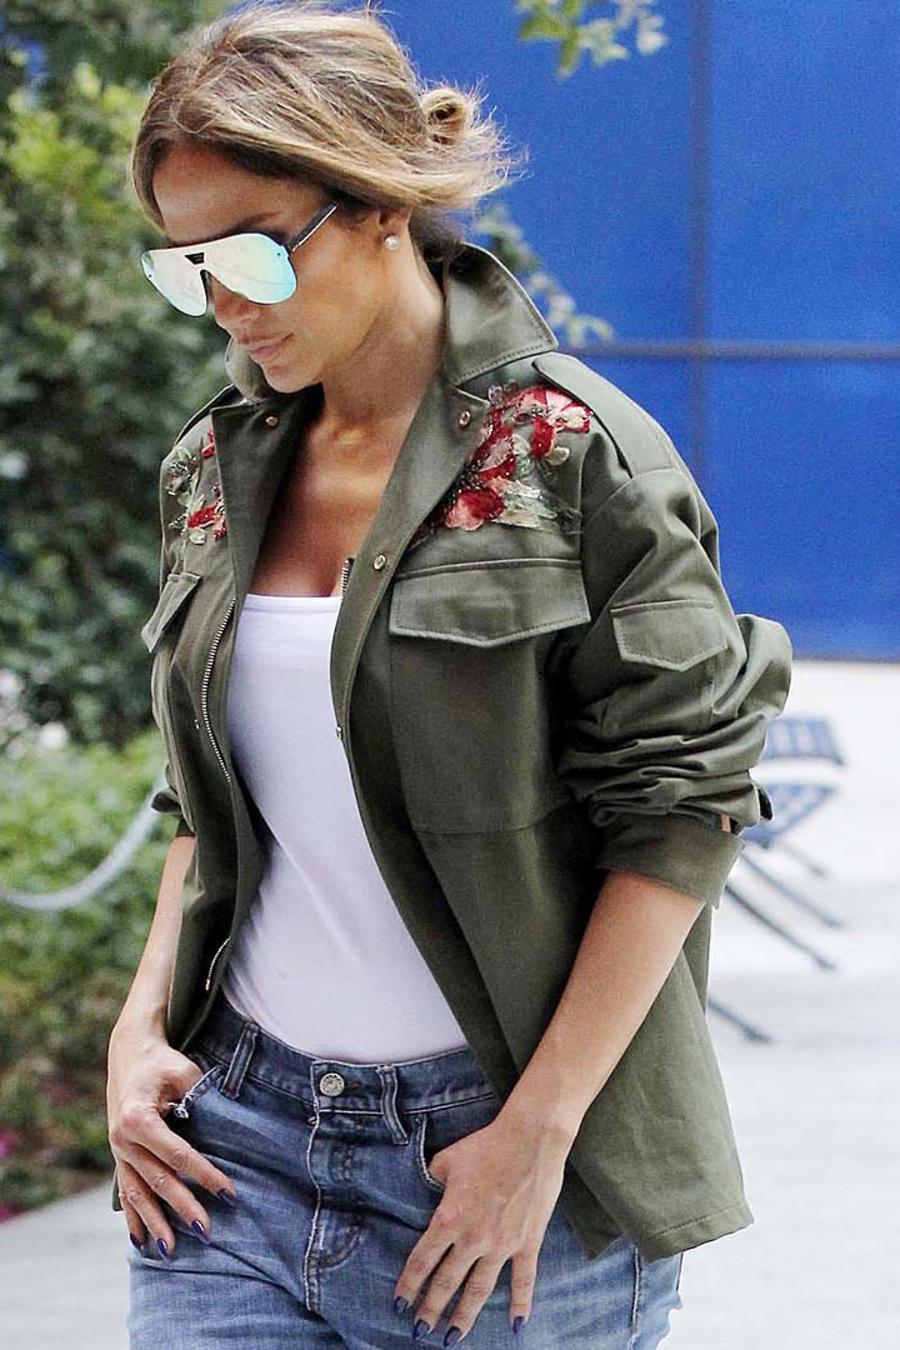 Jennifer Lopez caminando por la calle con estilo